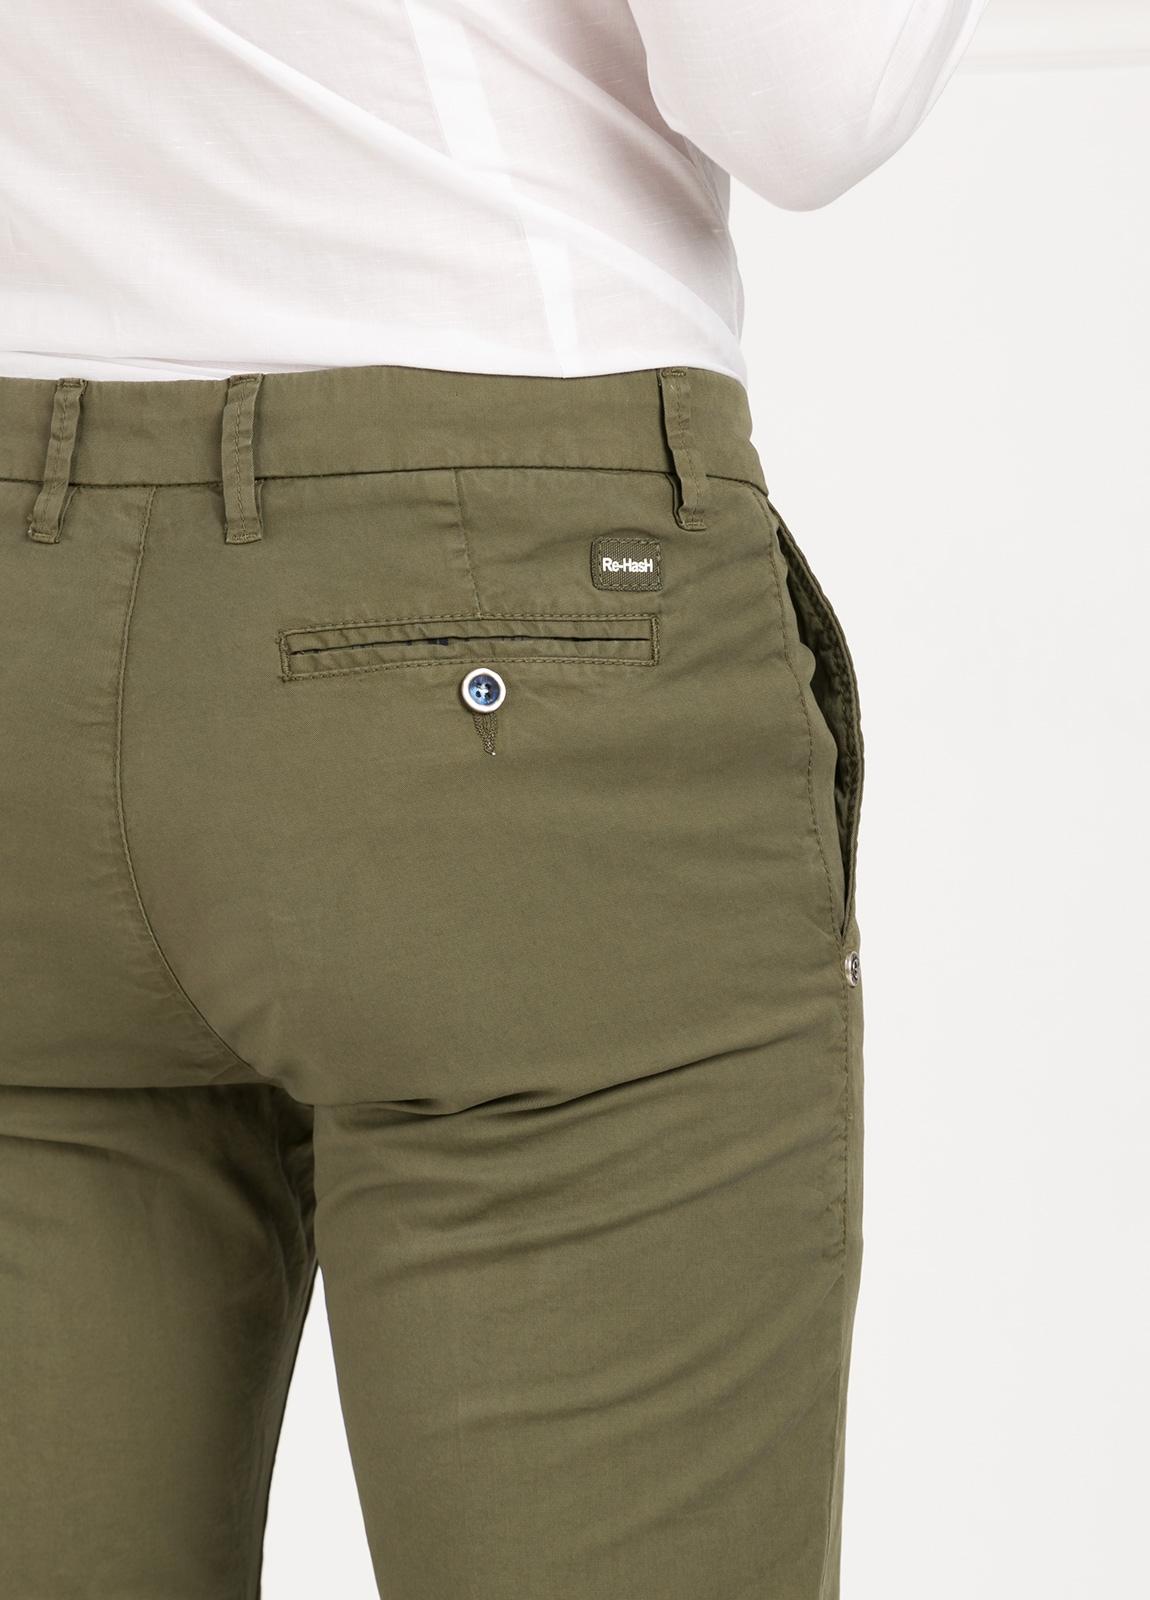 Pantalón sport modelo MUCHA P 249 color kaki. Algodón y elastáno. - Ítem1